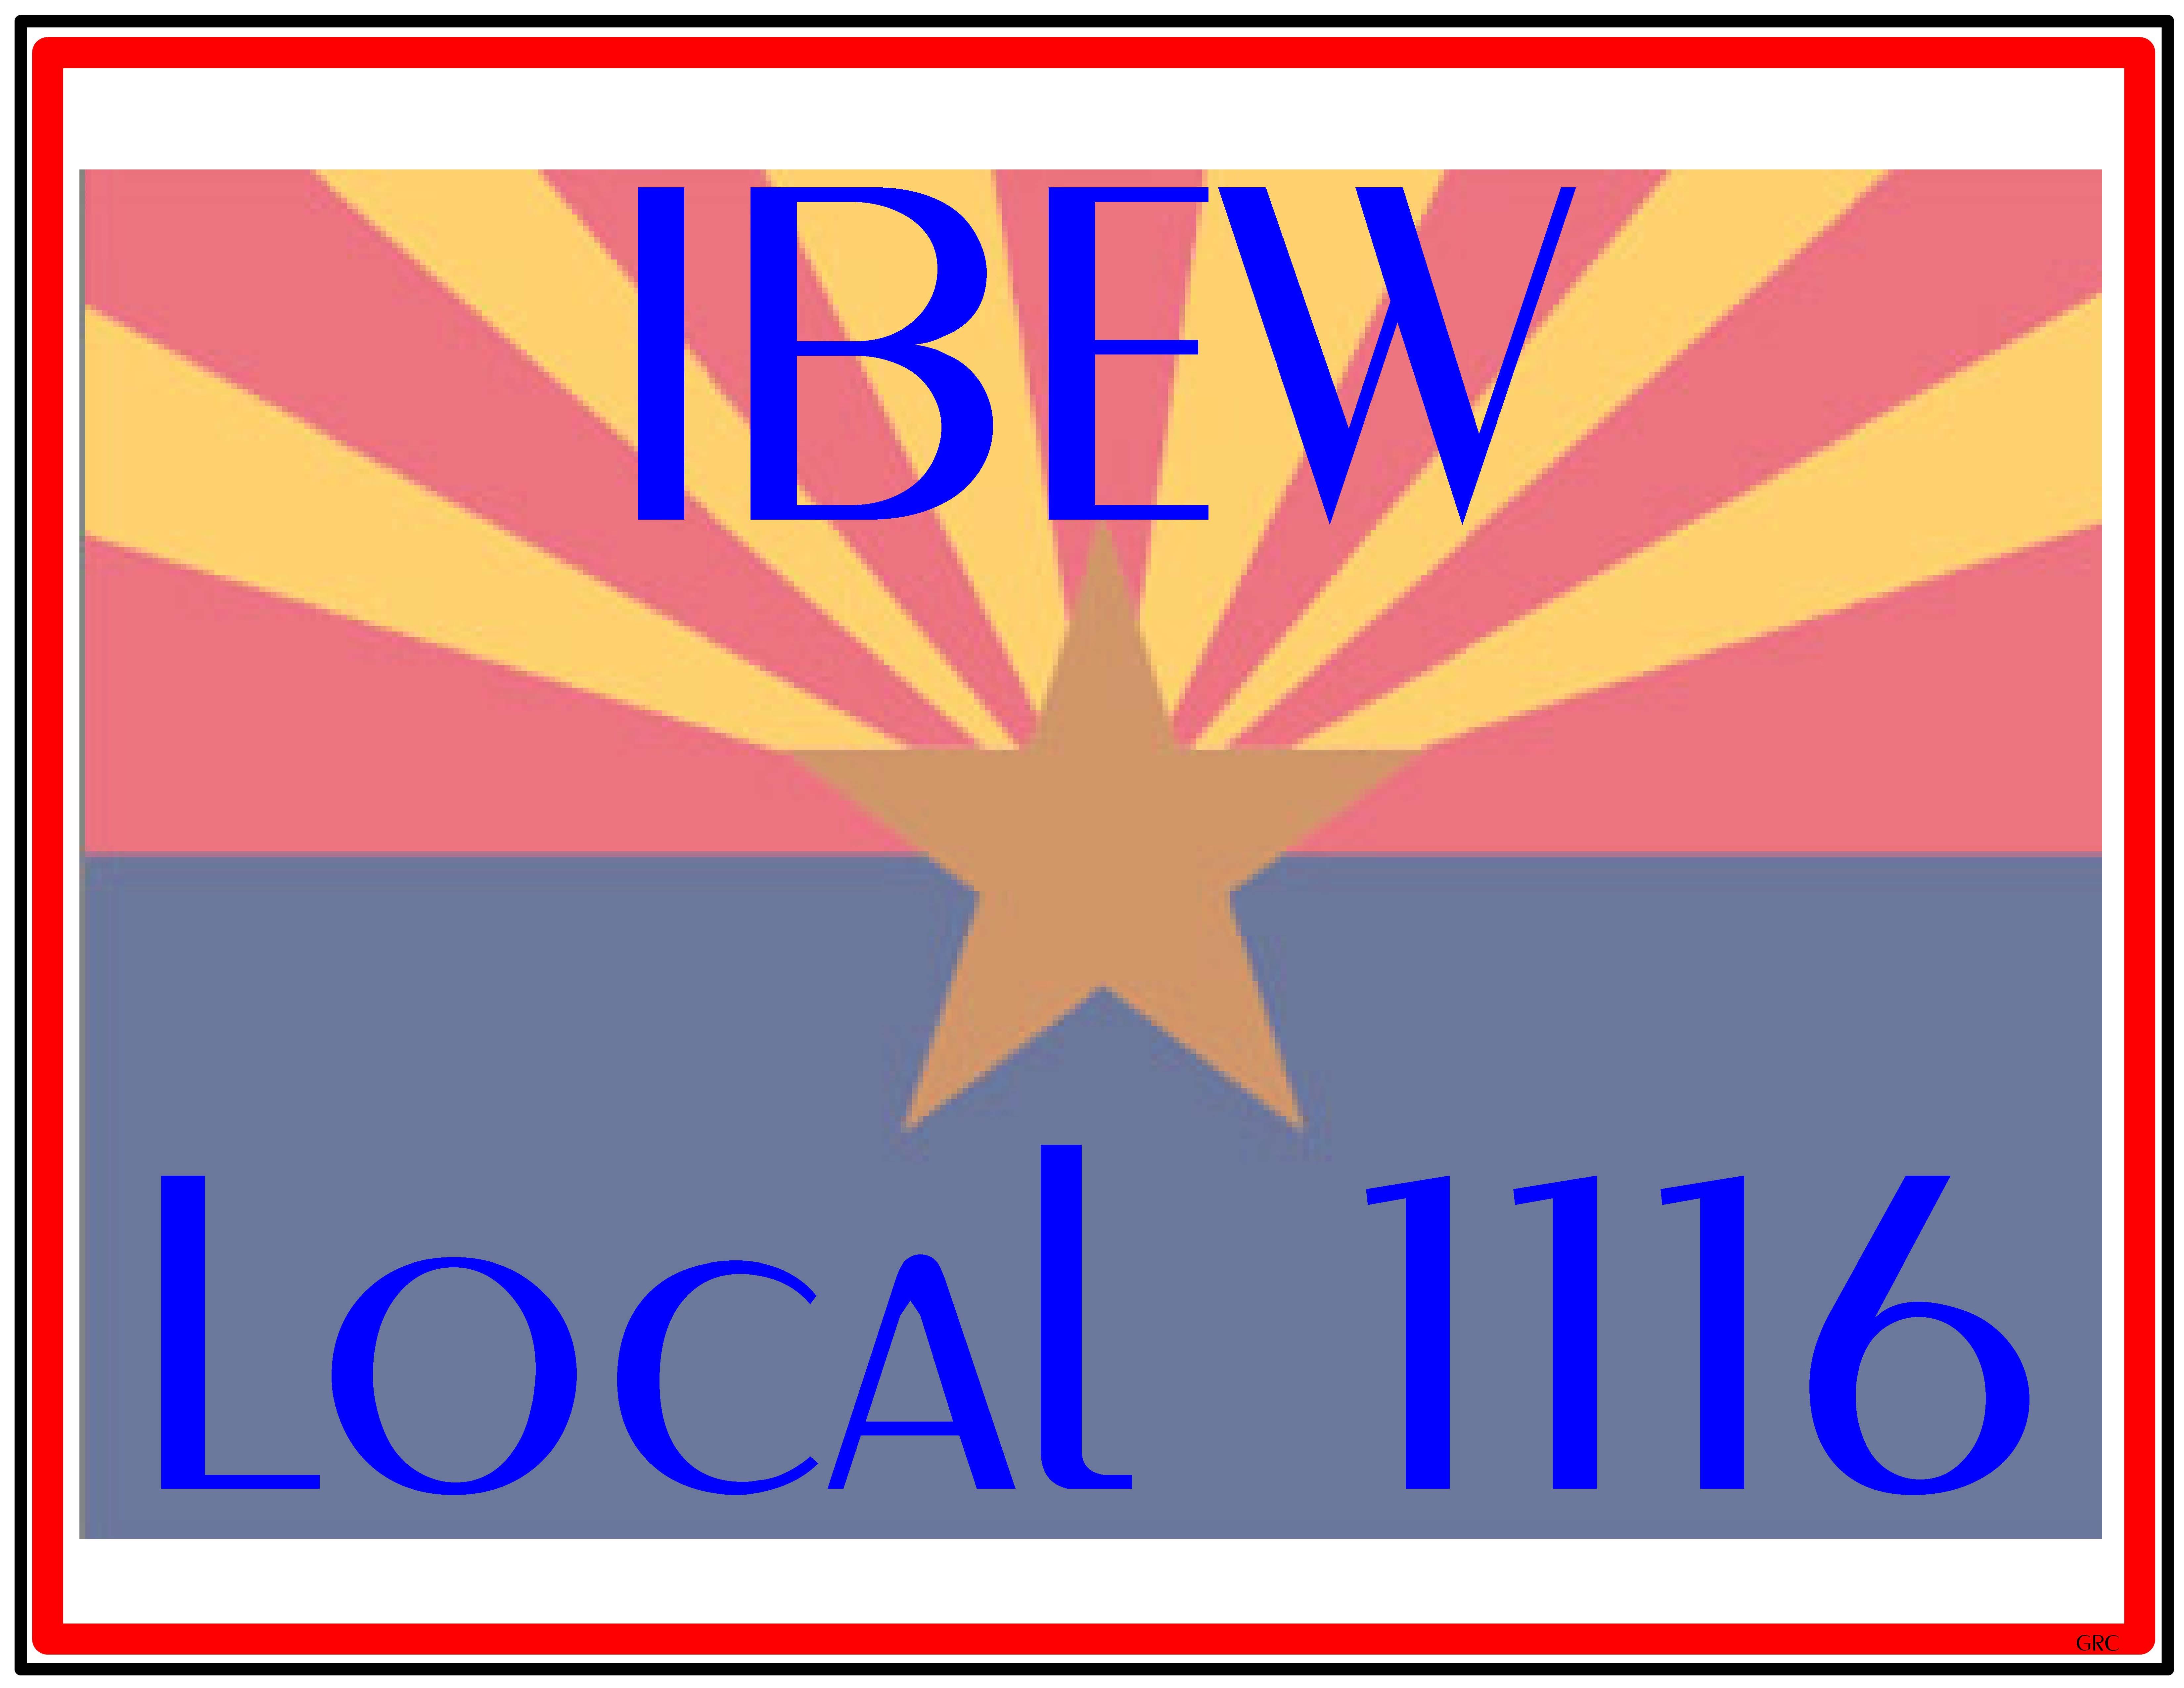 IBEW Local 1116